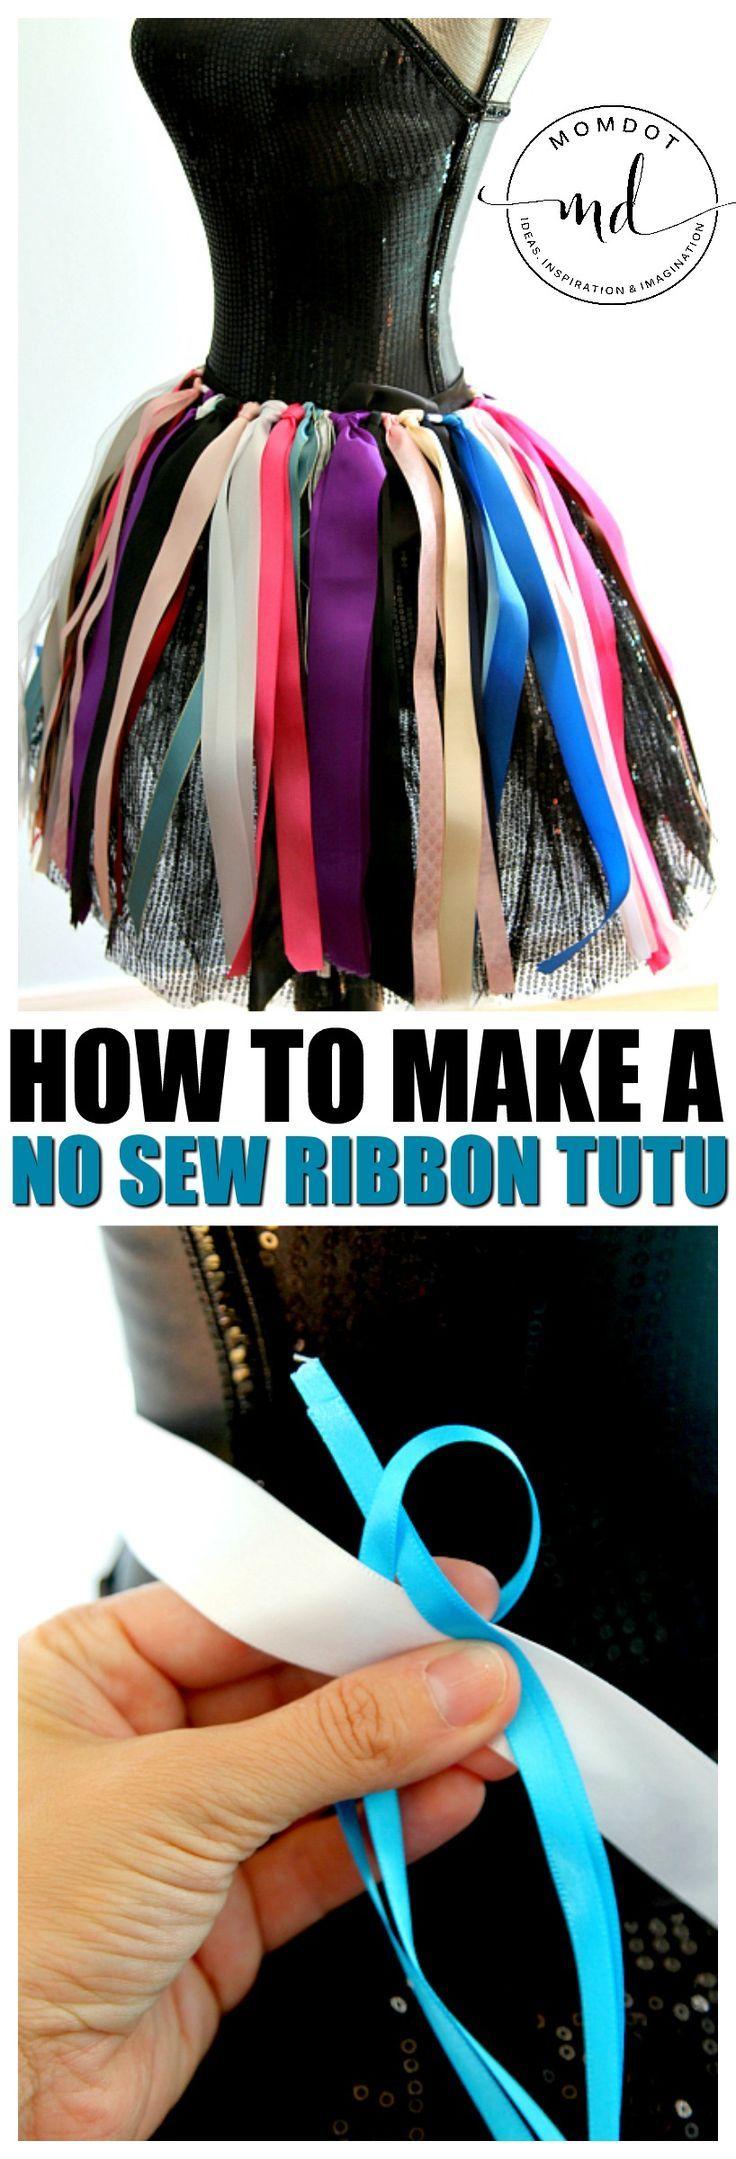 How to make a ribbon tutu tutorial | Halloween costuming crafts | no sew ribbon tutu DIY